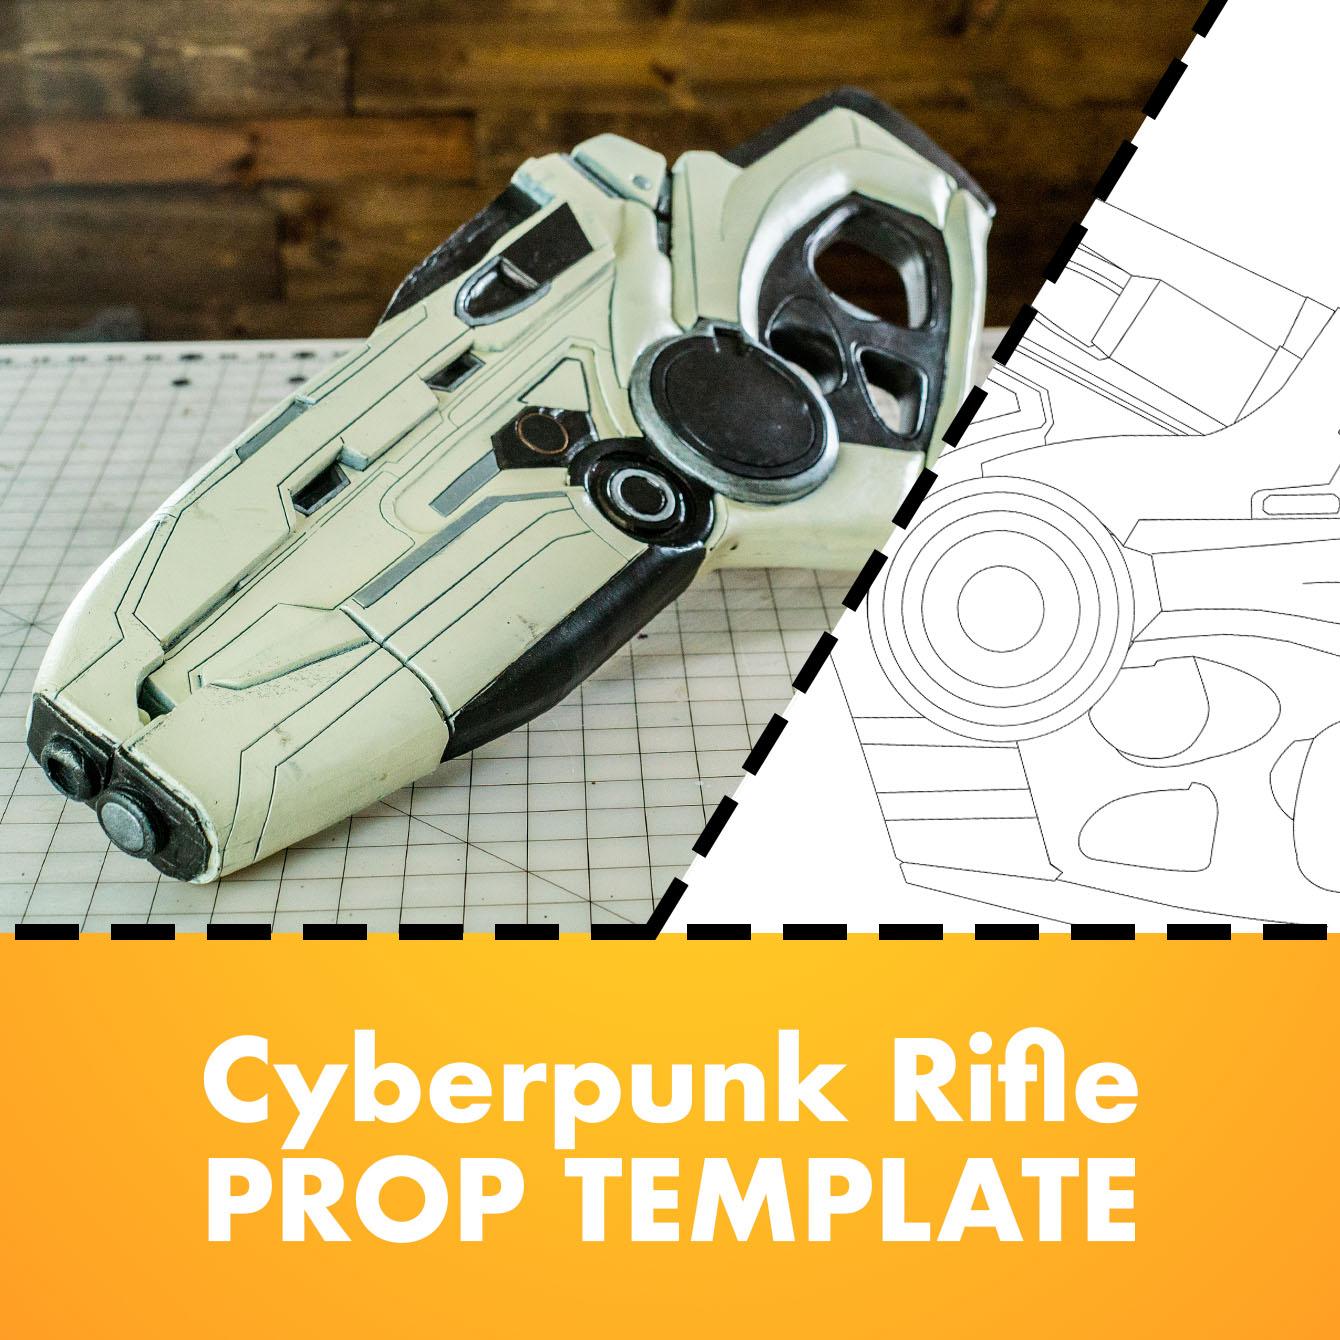 CyberpunkRifle_Cover.jpg